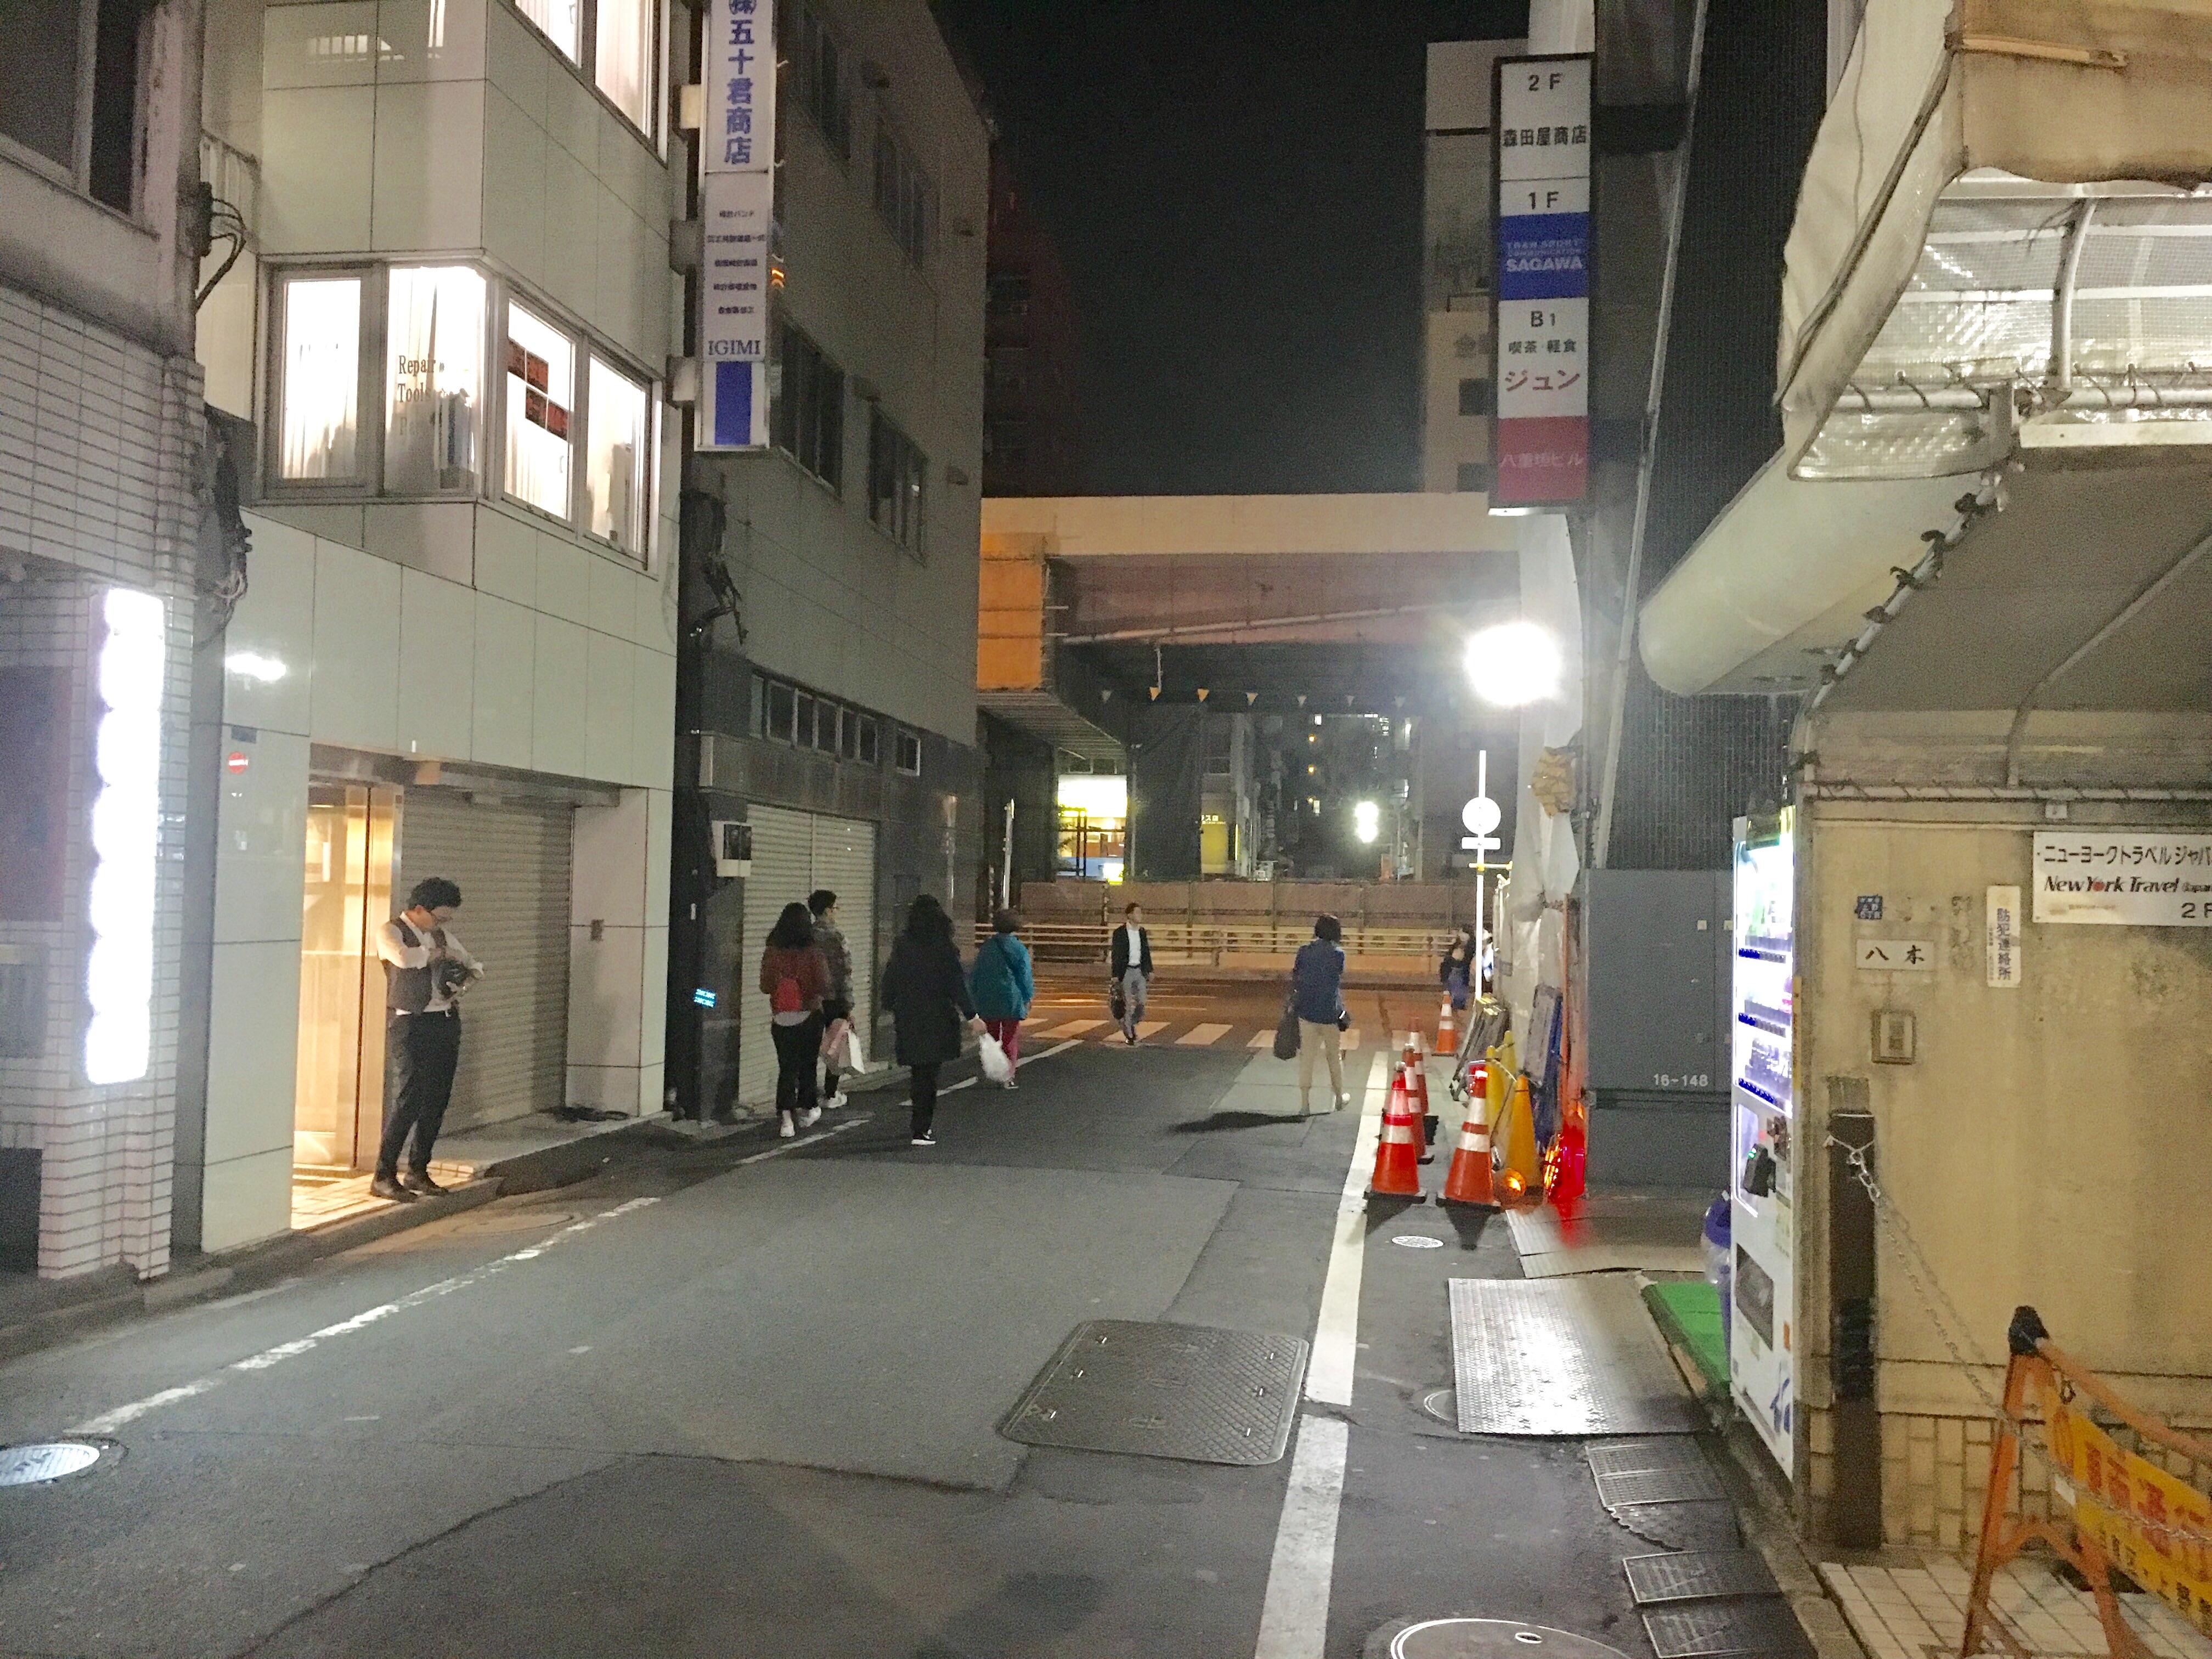 f:id:SoichiroIkeshita:20170606154233j:image